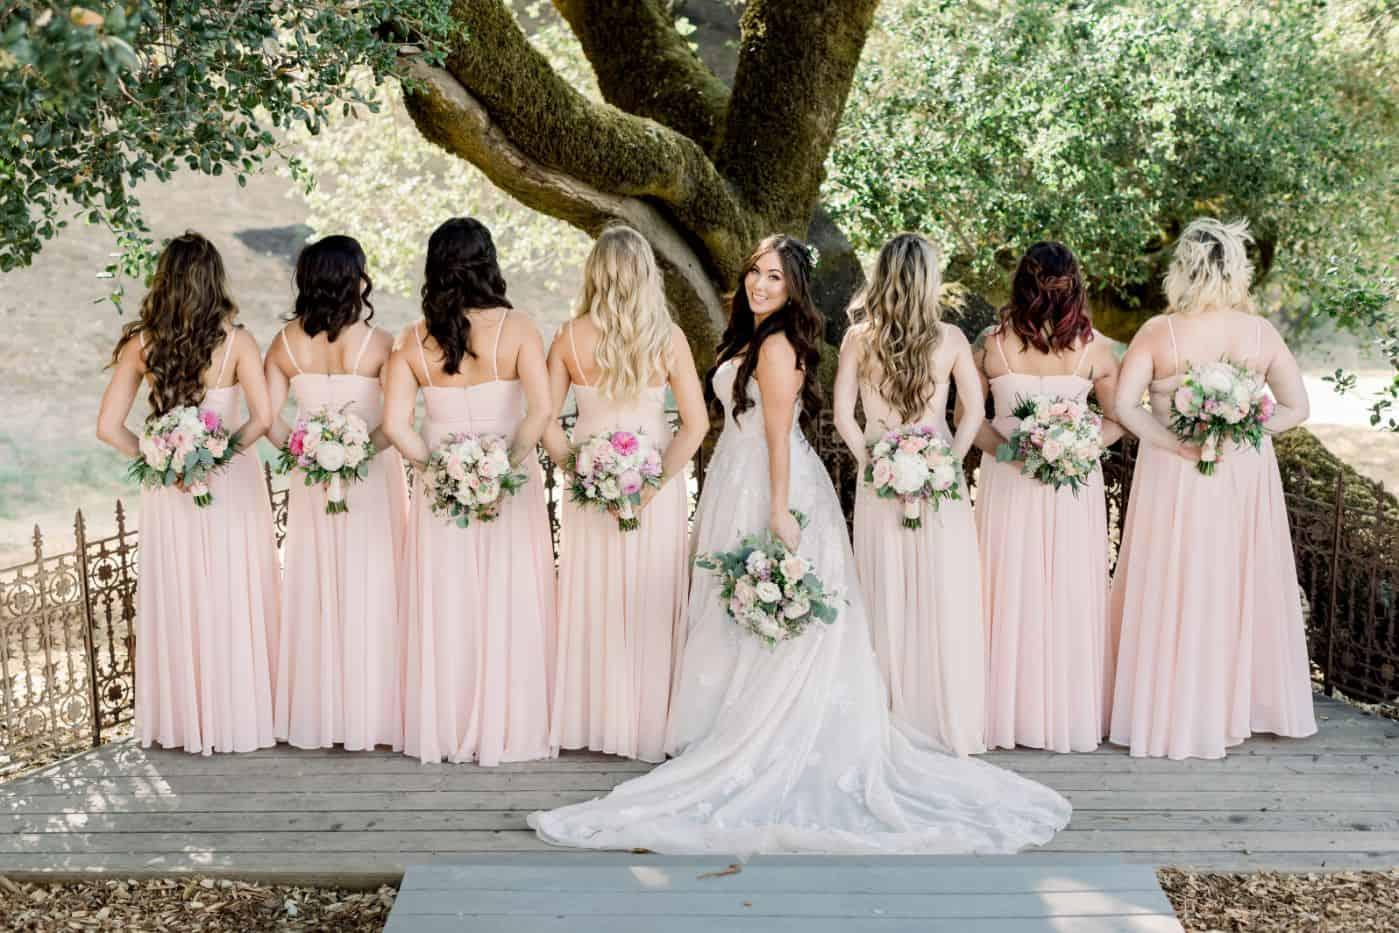 10 photo opportunities rustic mountain house estate weddingi venues northern california